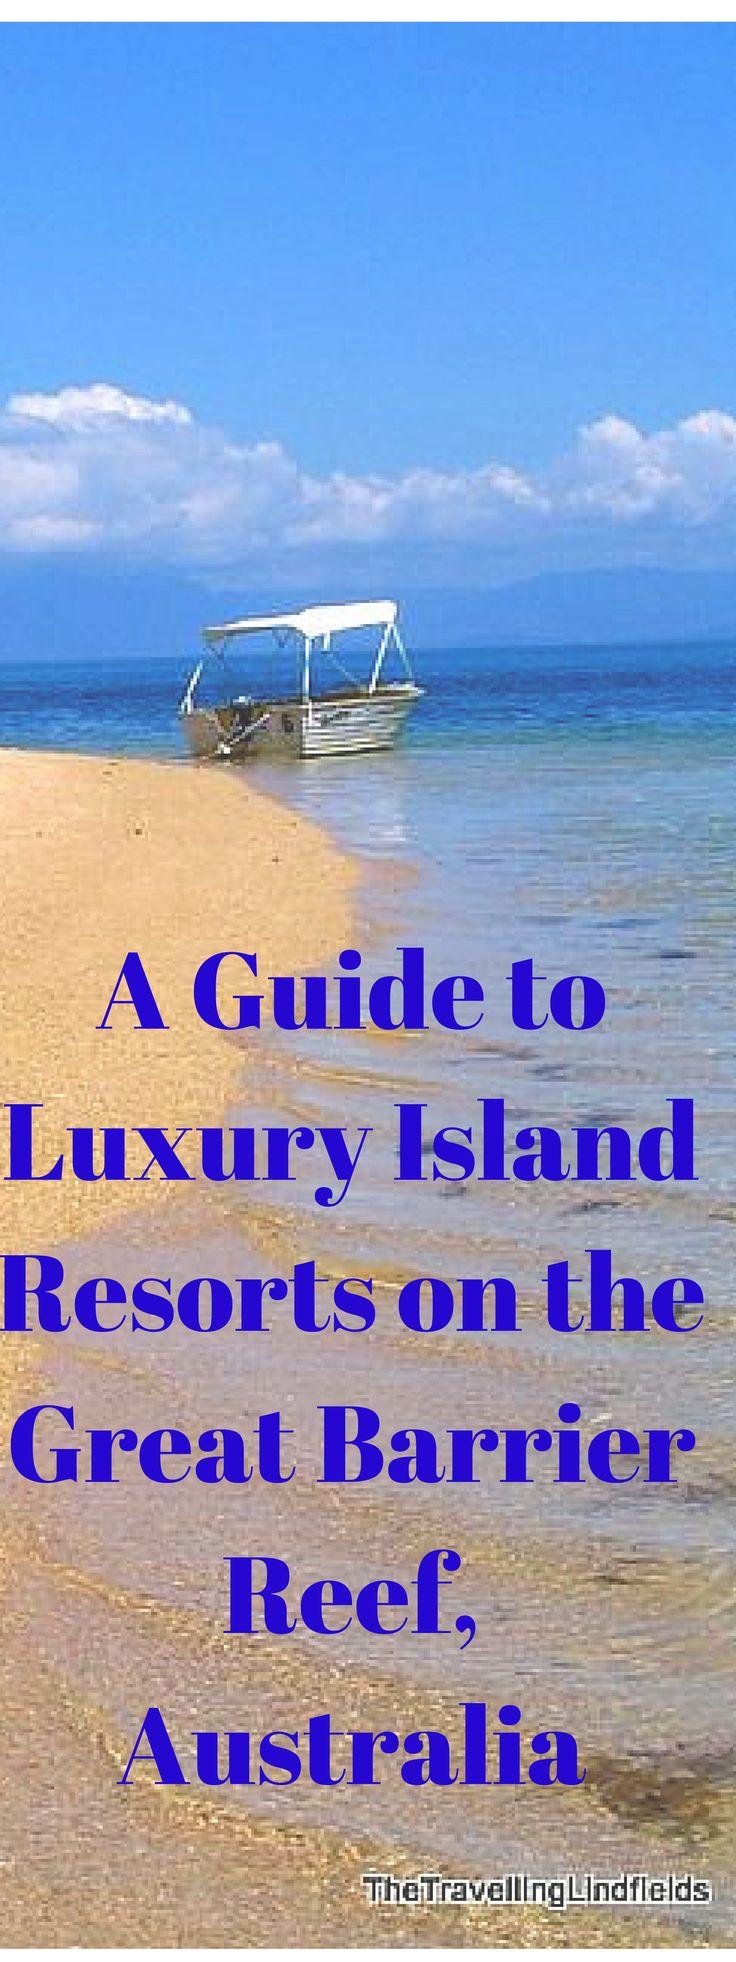 Lizard Island, Qualia and Bedarra Island - a guide to luxury island resorts on the Great Barrier Reef, Australia http://www.thetravellinglindfields.com/2015/05/the-great-barrier-reef-luxury-island.html